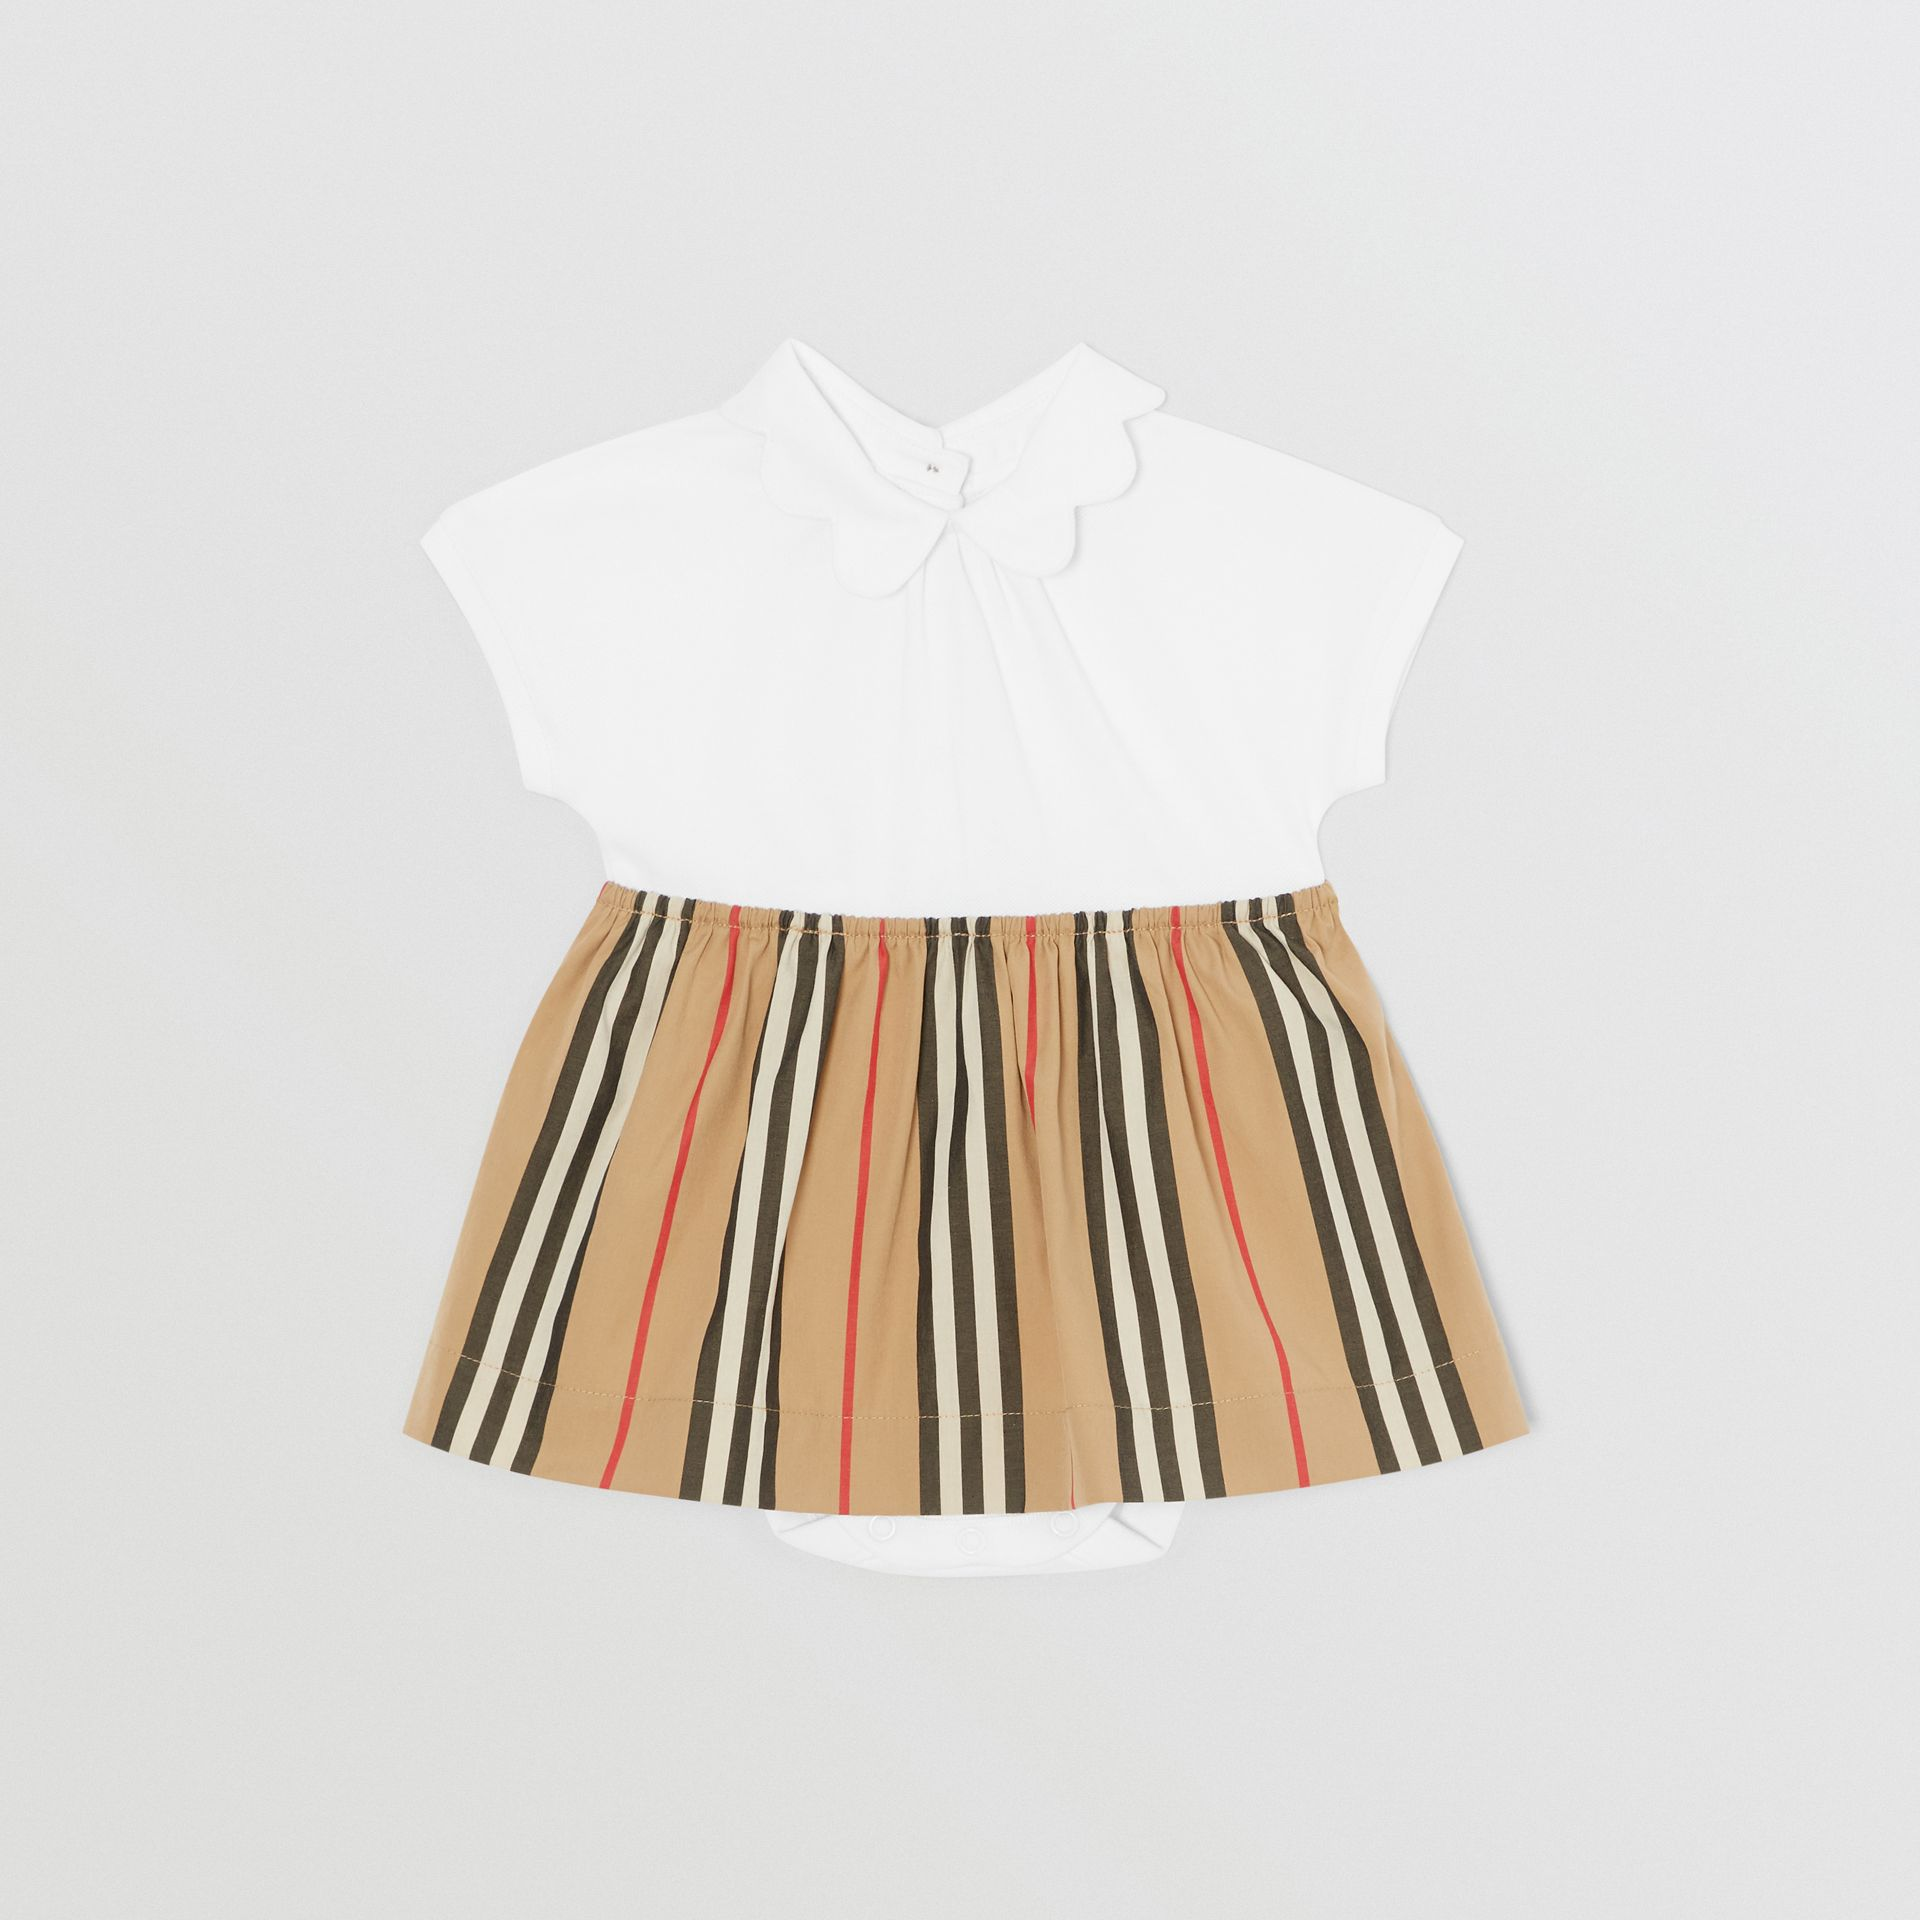 Icon Stripe Skirt Cotton Piqué Bodysuit in White - Children | Burberry United Kingdom - gallery image 0